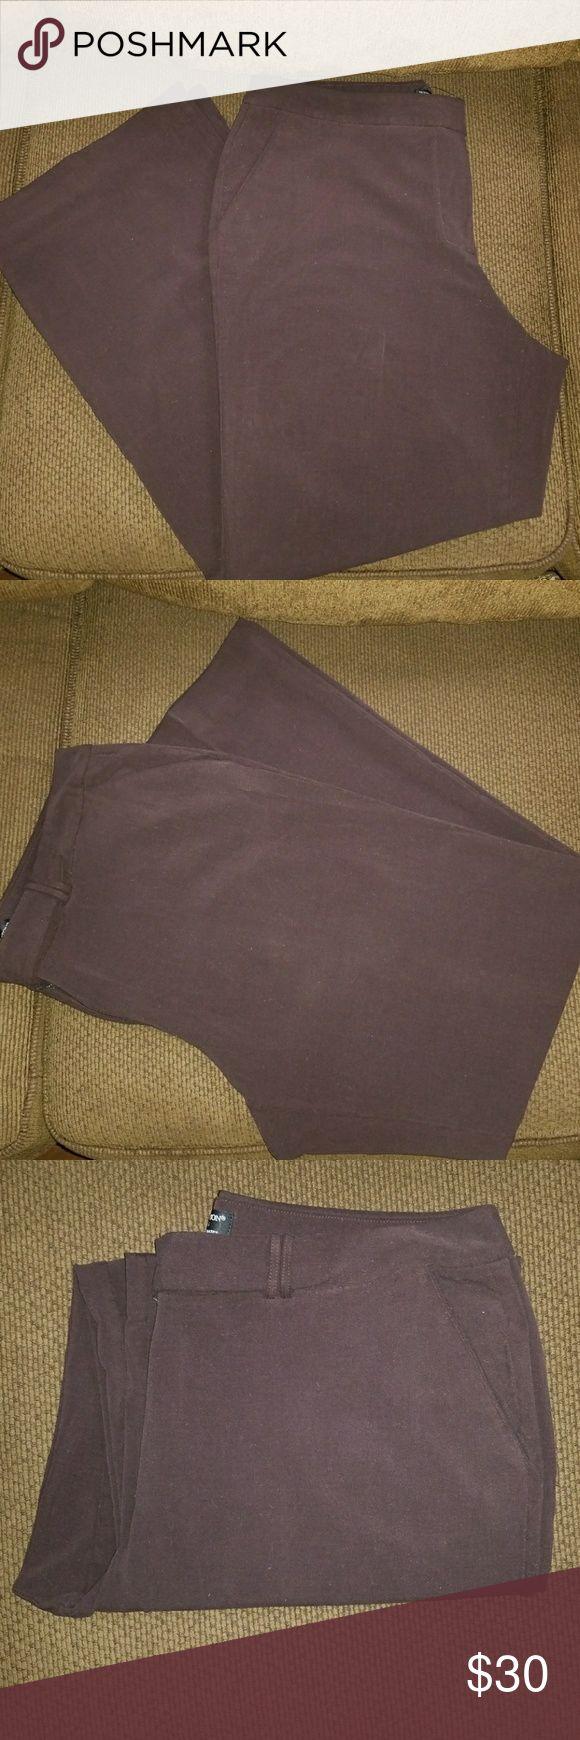 Worthington works stretch brown slacks Worthington works stretch separates,dark brown women's dress slacks, two front side pockets, size 14 average. Worthington Pants Trousers